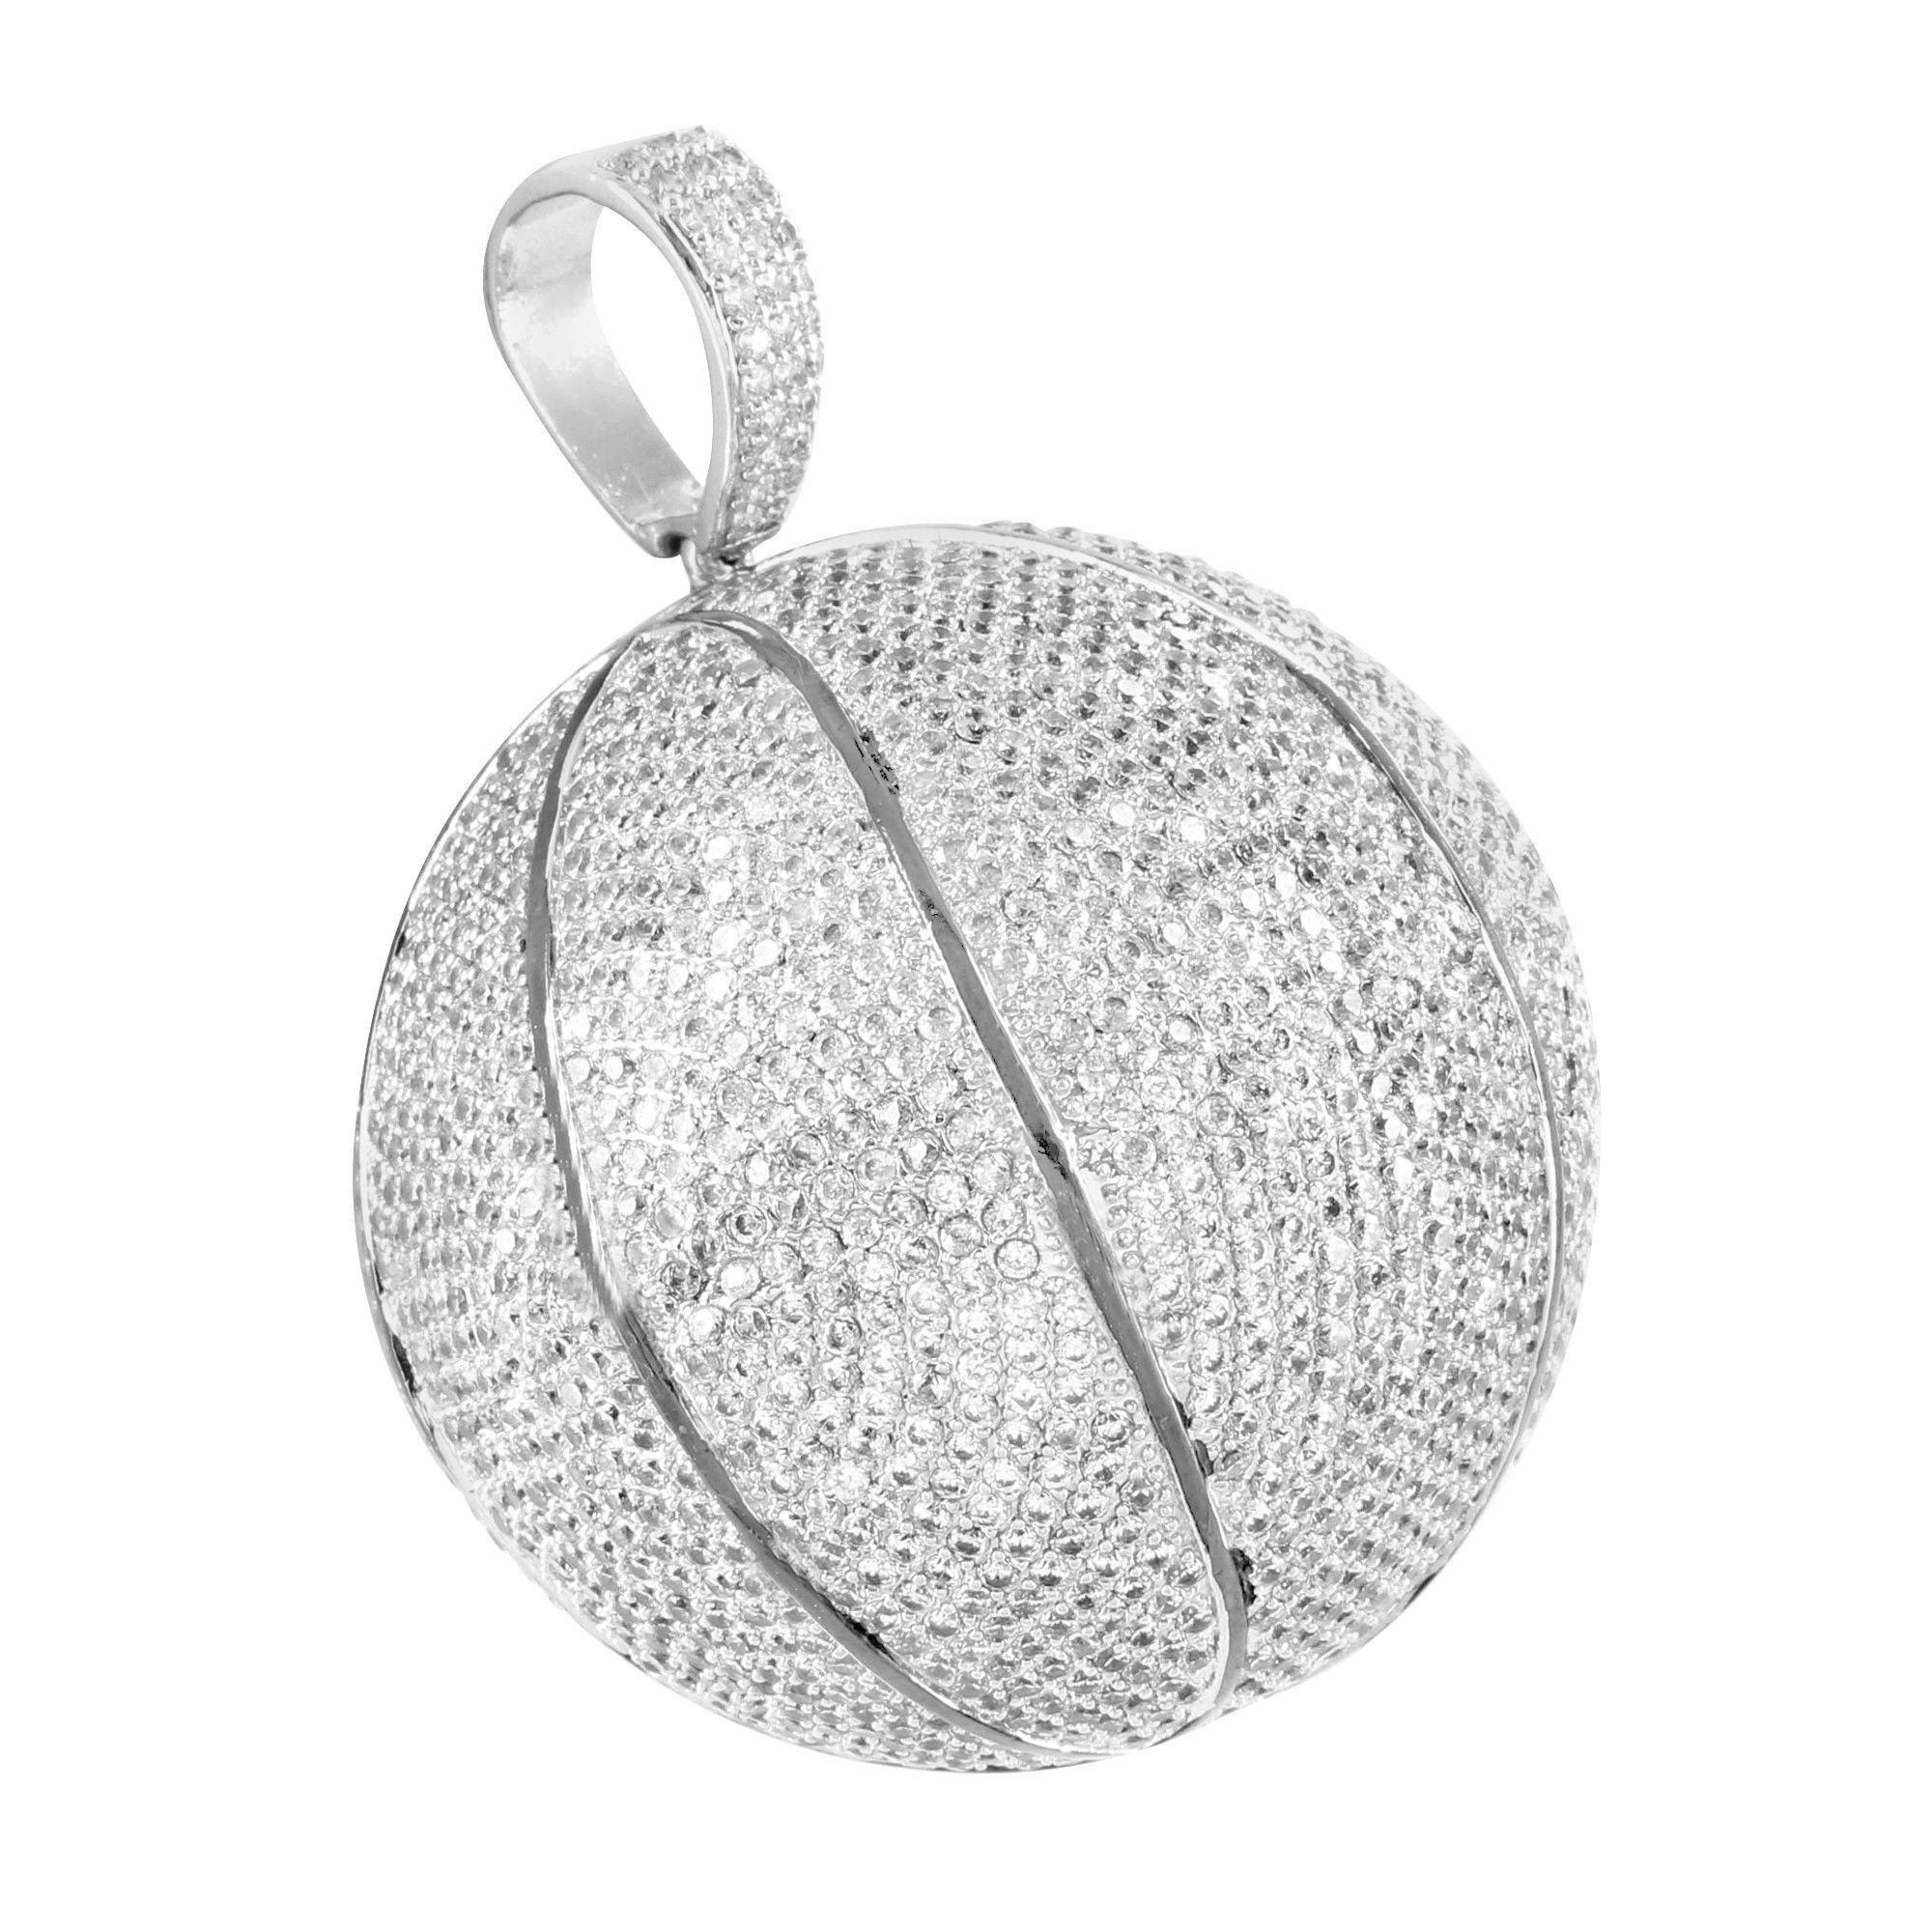 Nba basketball pendant 14k white gold finish lab diamond products nba basketball pendant 14k white gold finish lab diamond mozeypictures Gallery